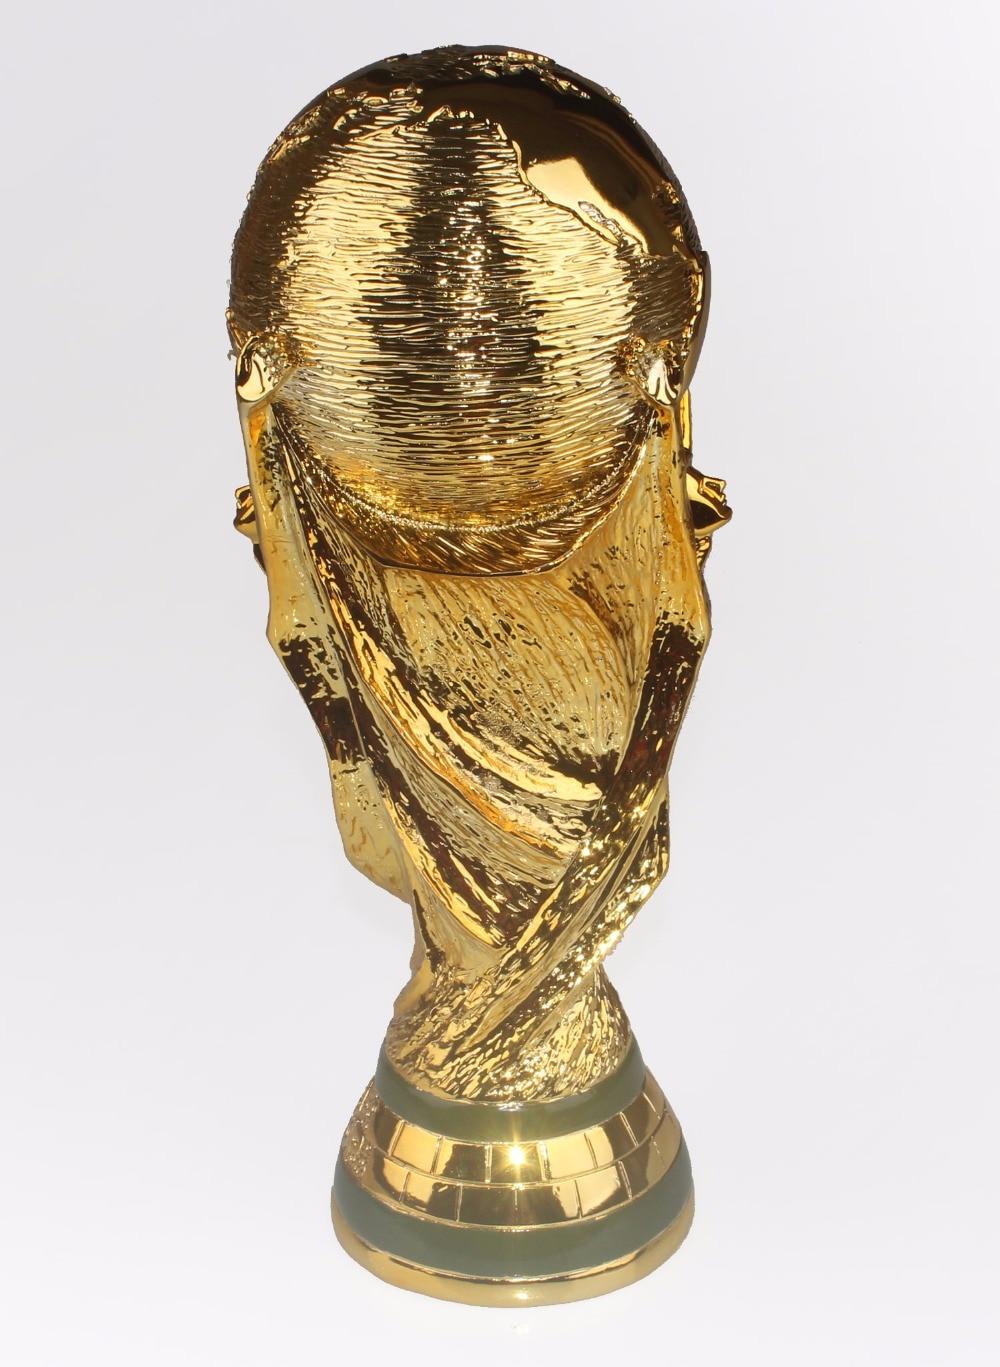 1:1.3 27cm <font><b>World</b></font> <font><b>Cup</b></font> Football <font><b>trophy</b></font> <font><b>Resin</b></font> Replica <font><b>Trophies</b></font> <font><b>Model</b></font> Brazil <font><b>World</b></font> <font><b>Cup</b></font> Best Soccer Fan <font><b>Souvenir</b></font> <font><b>Gift</b></font>